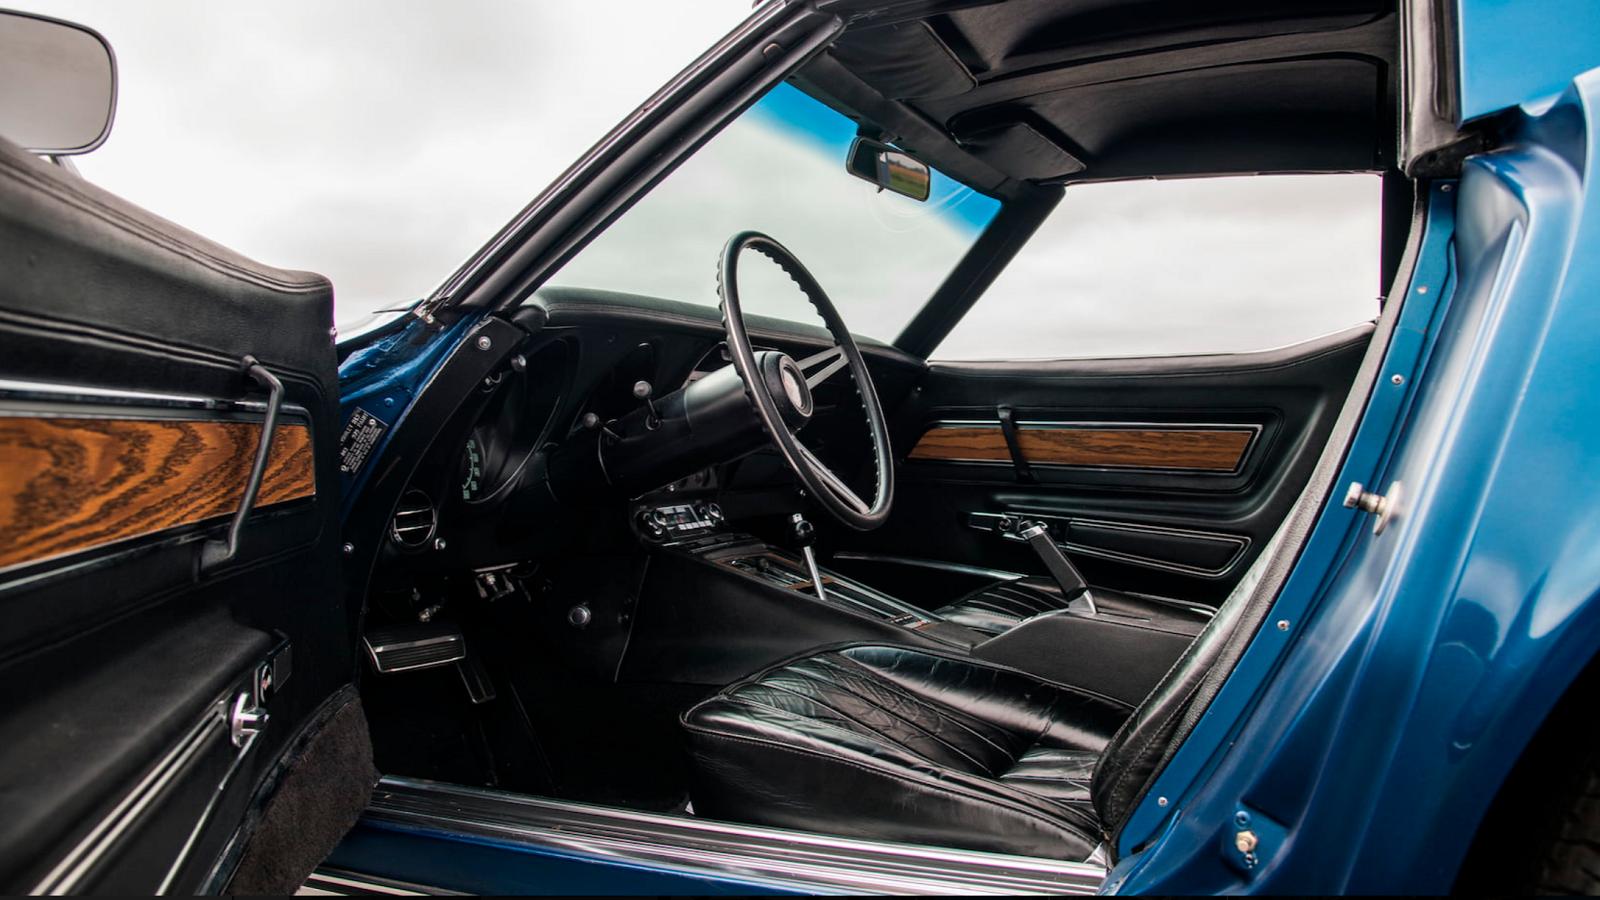 Top Flight 1971 Chevrolet Corvette LS6 Is a 1-Of-188 Bruiser